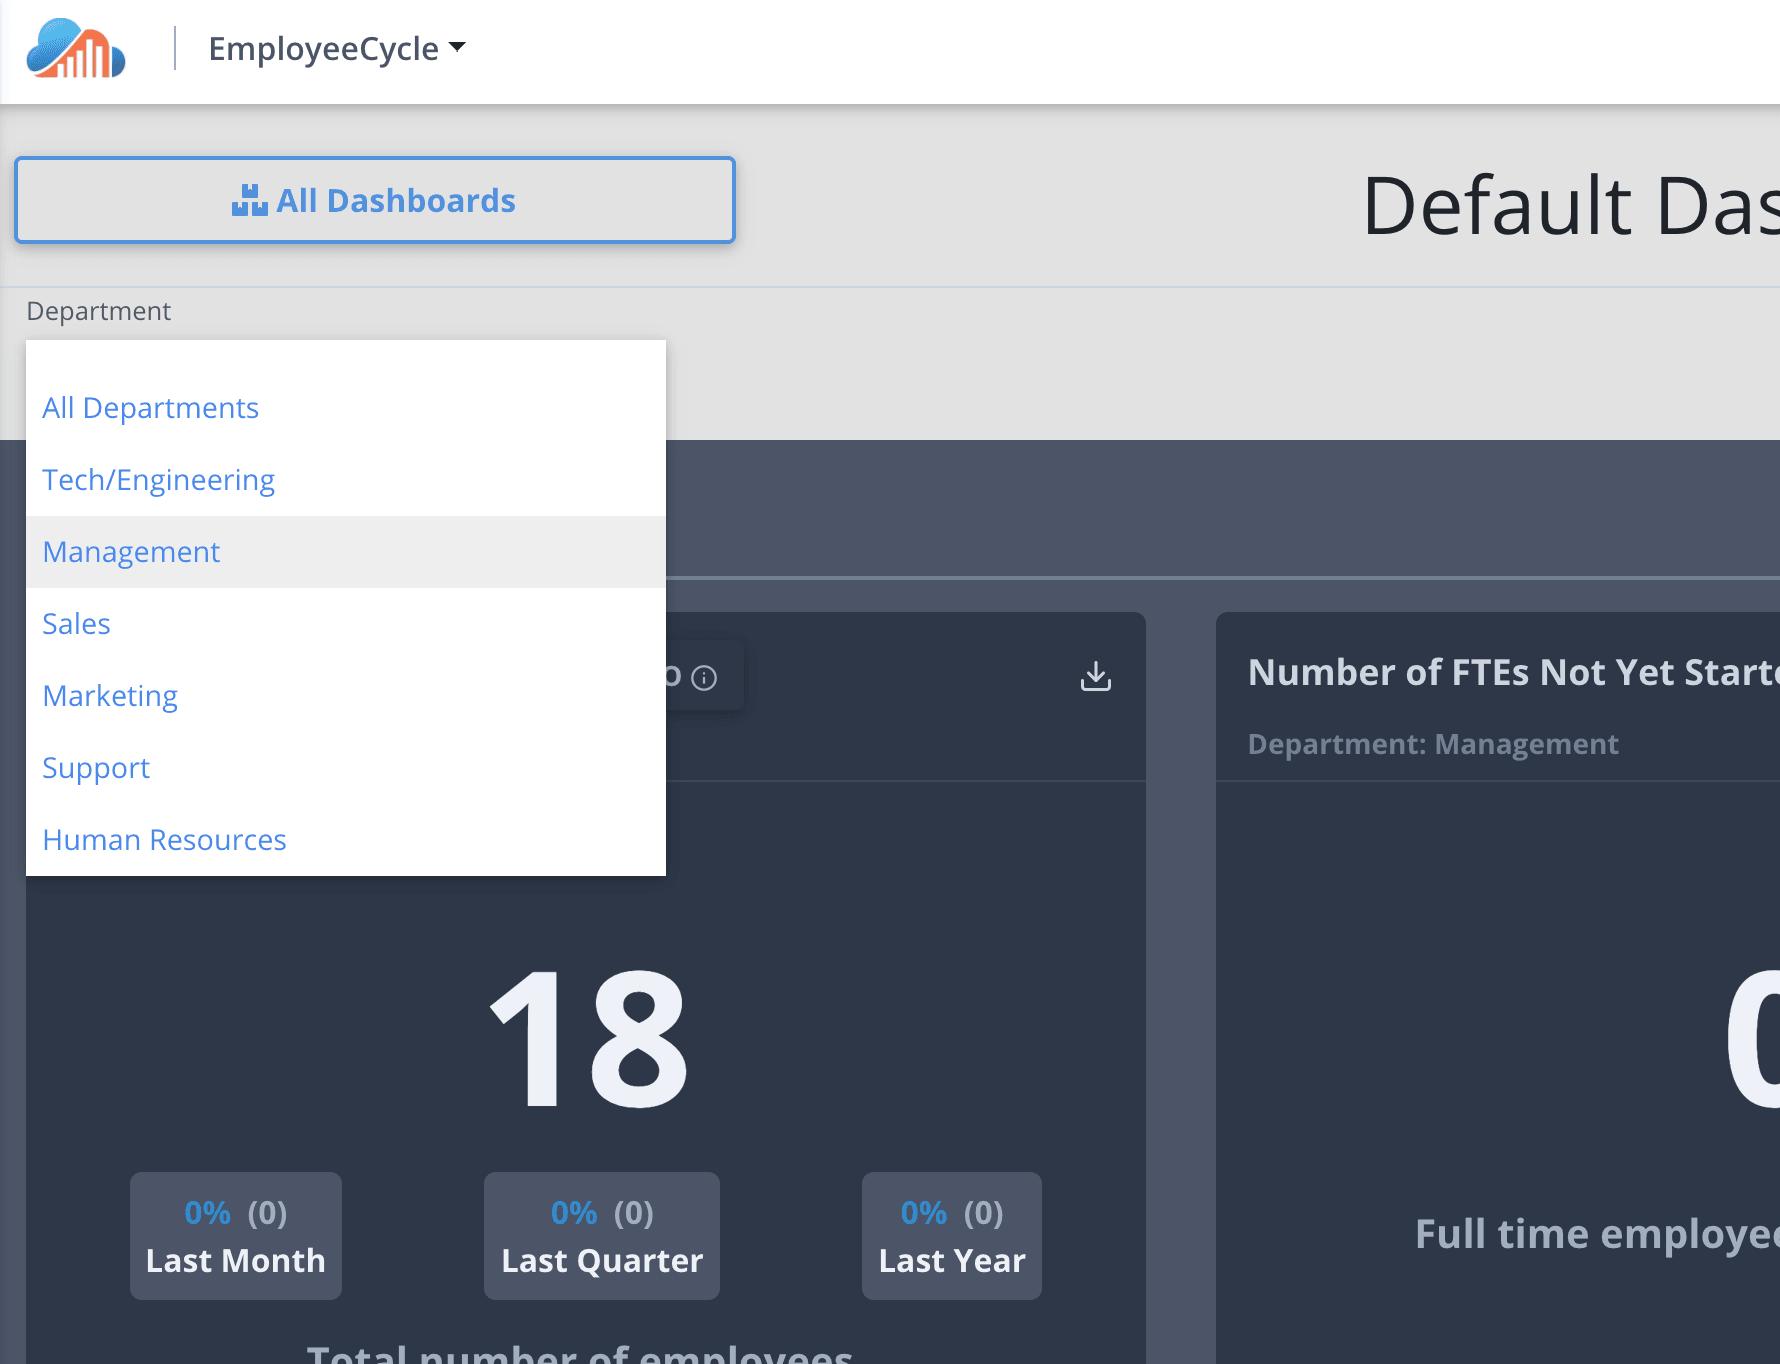 Department filter